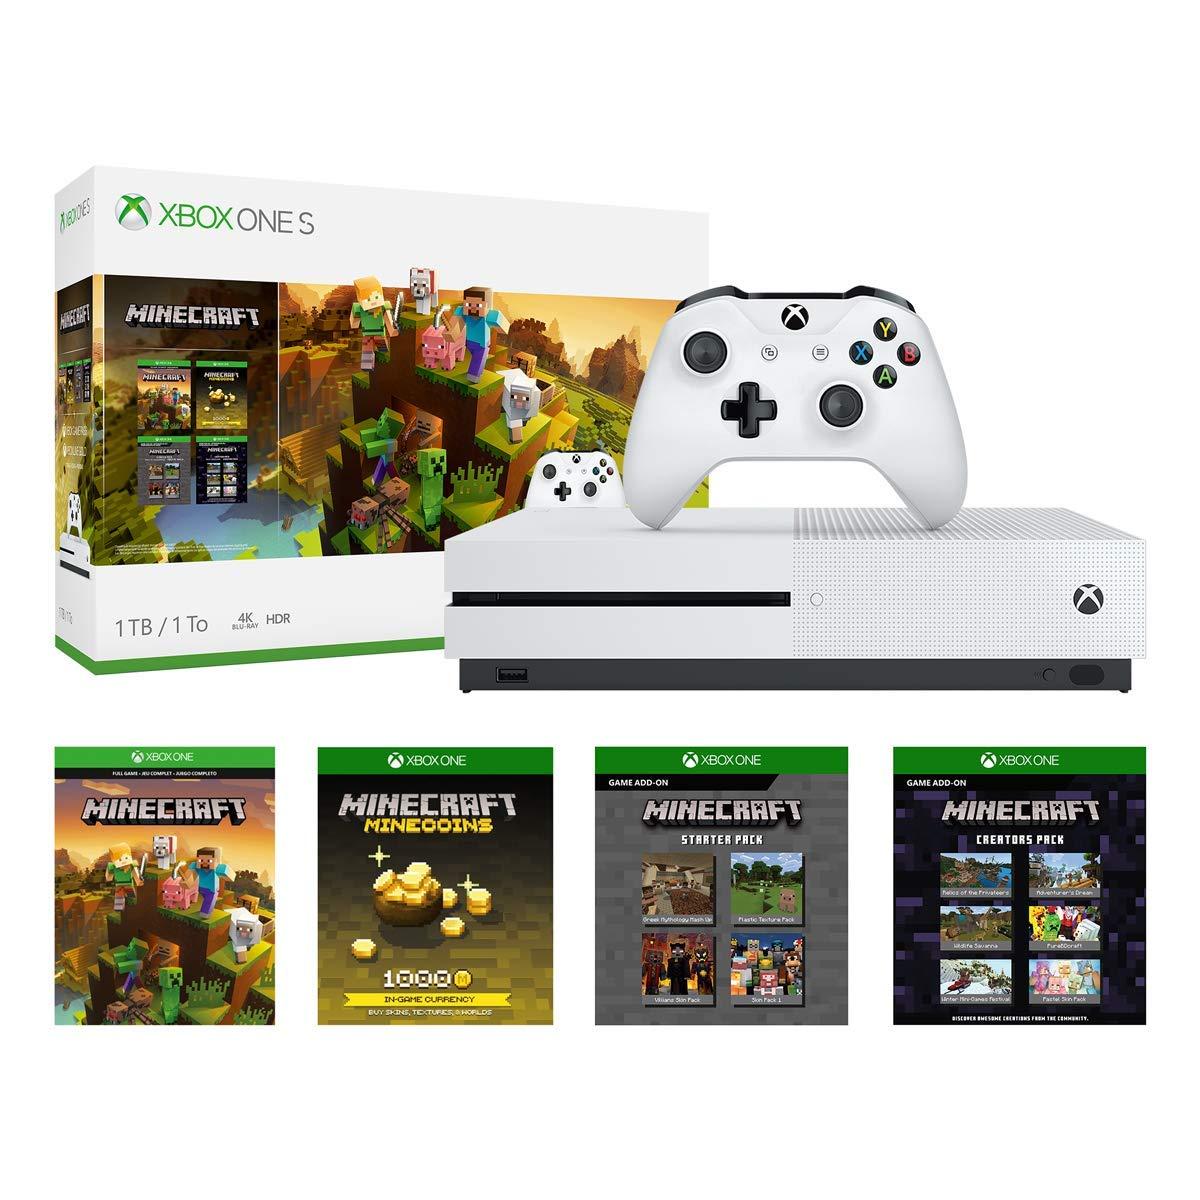 Xbox One S 1TB Console - Minecraft Creators Bundle (Renewed) by Microsoft (Image #1)